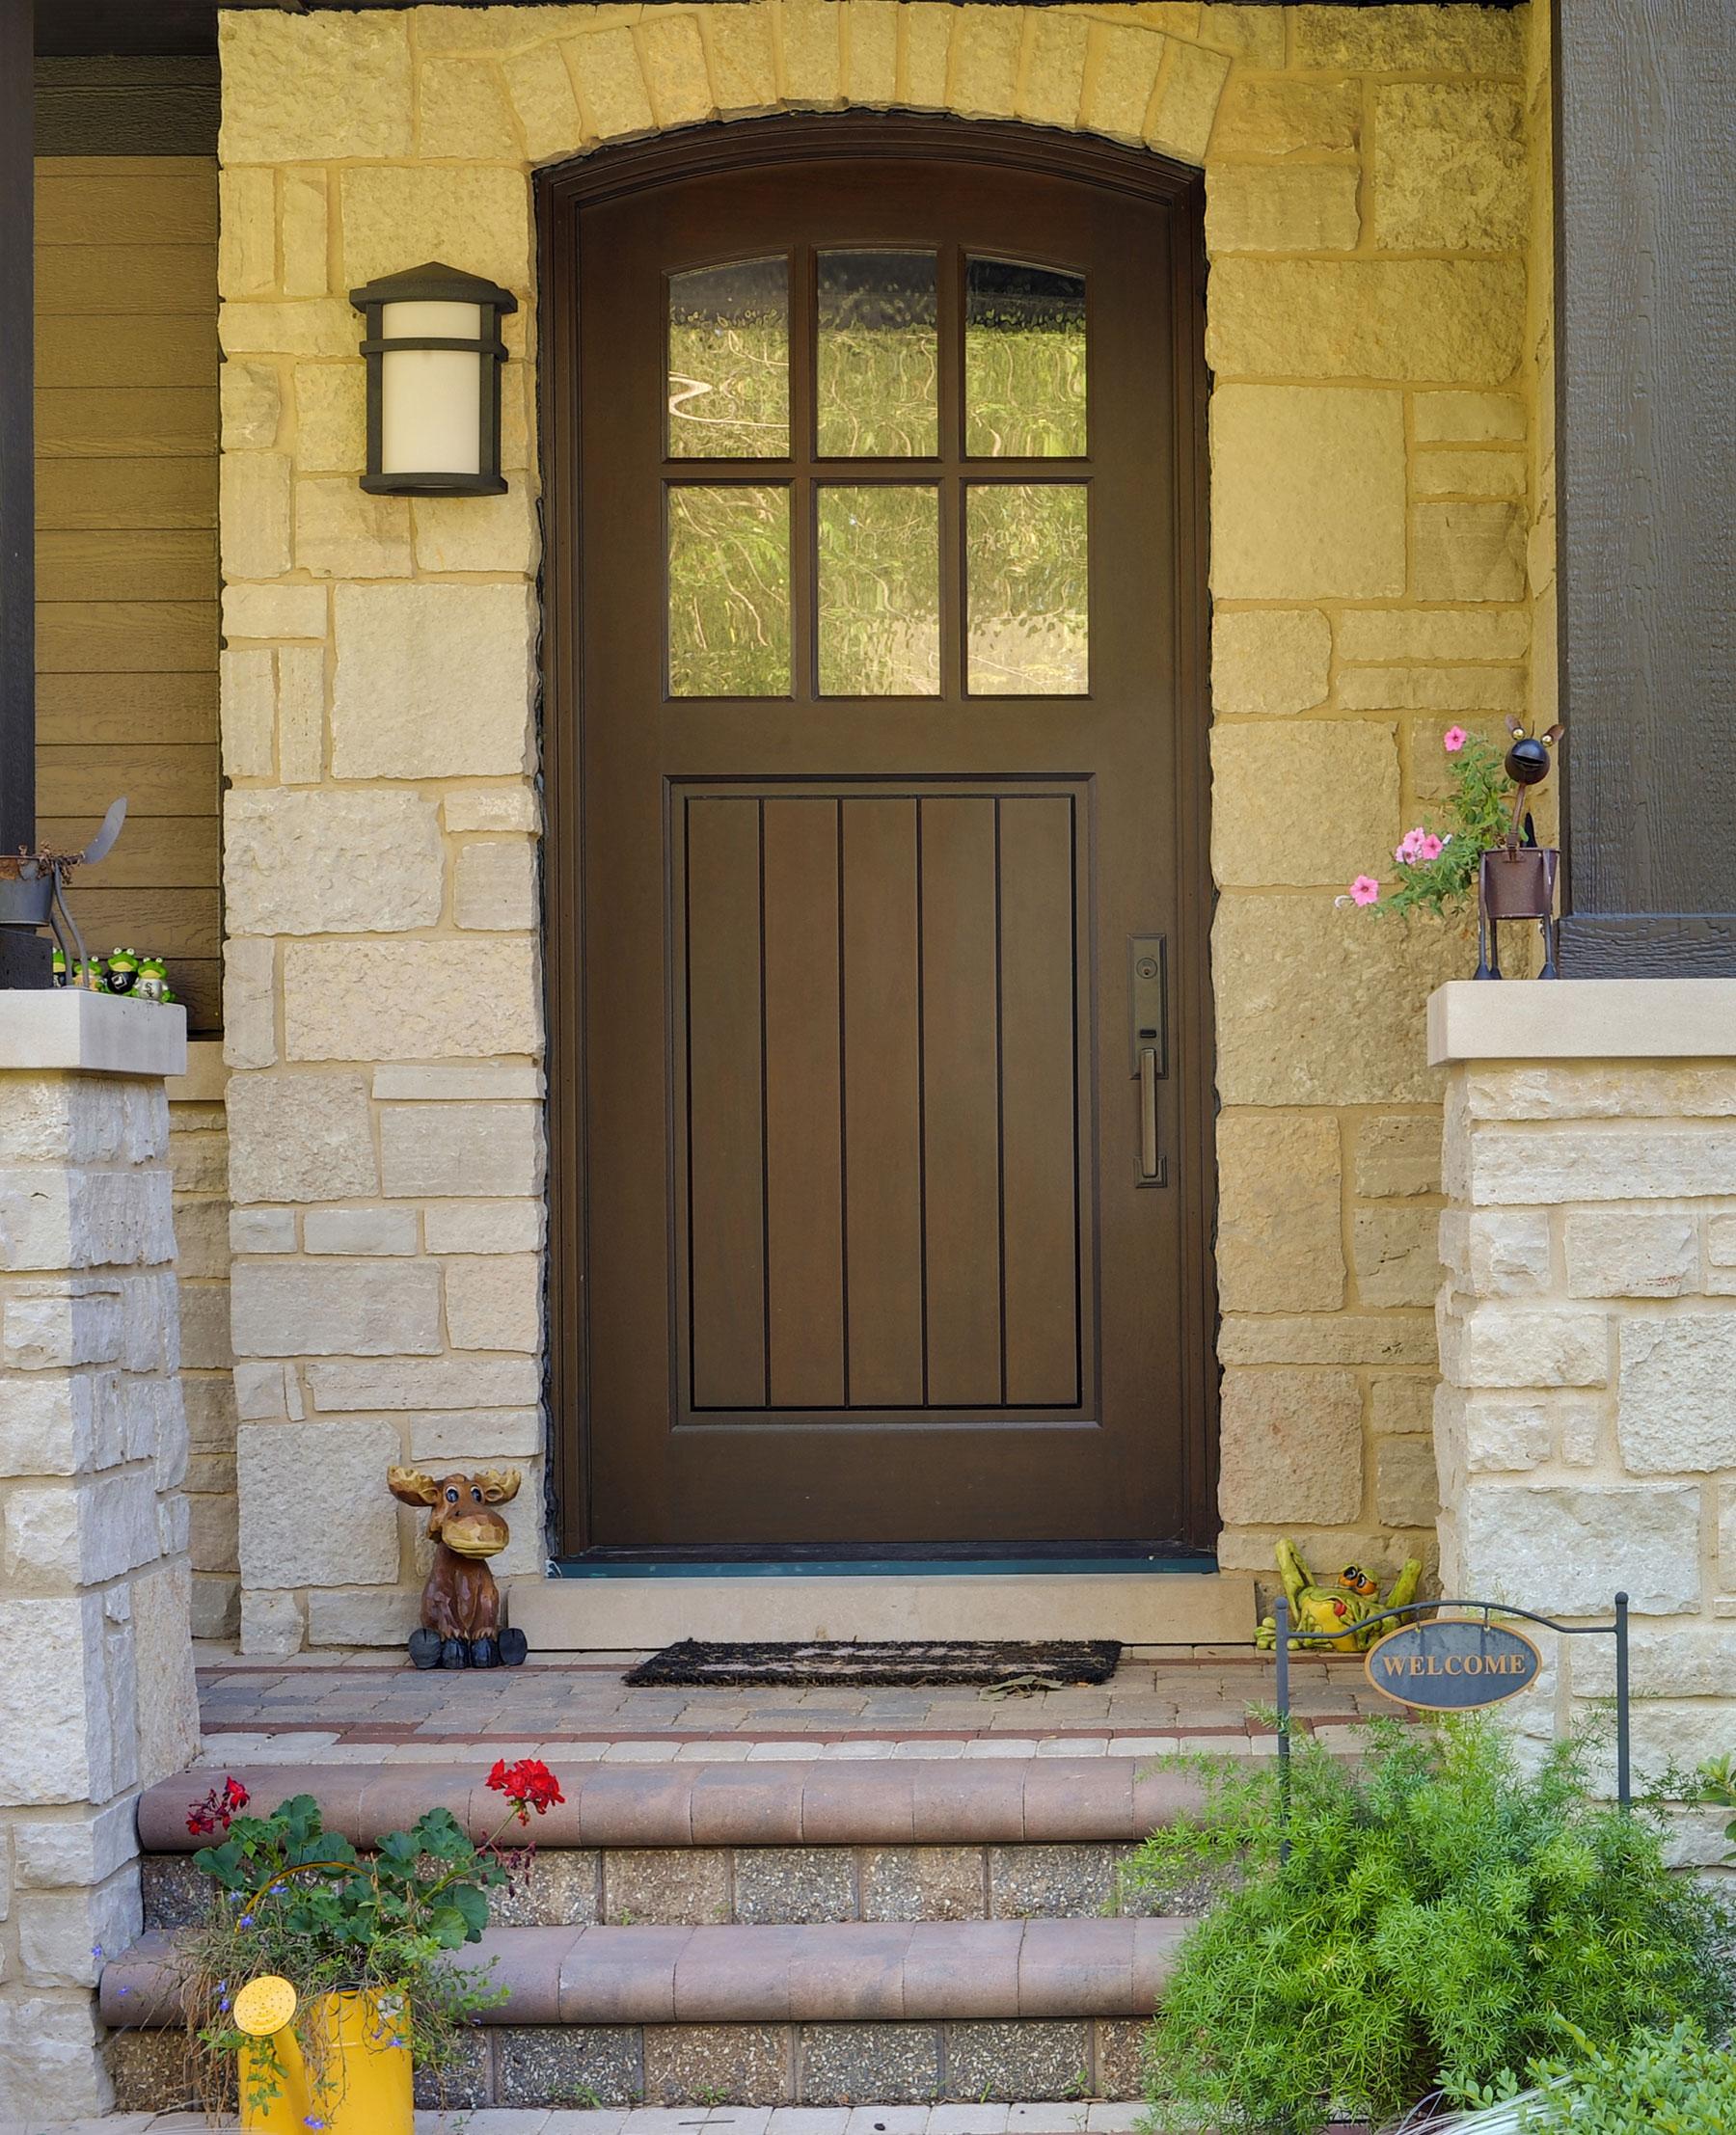 Custom Wood Front Entry Doors | single door privacy glass, in classic french collection  - Glenview Doors - Custom Doors in Chicago